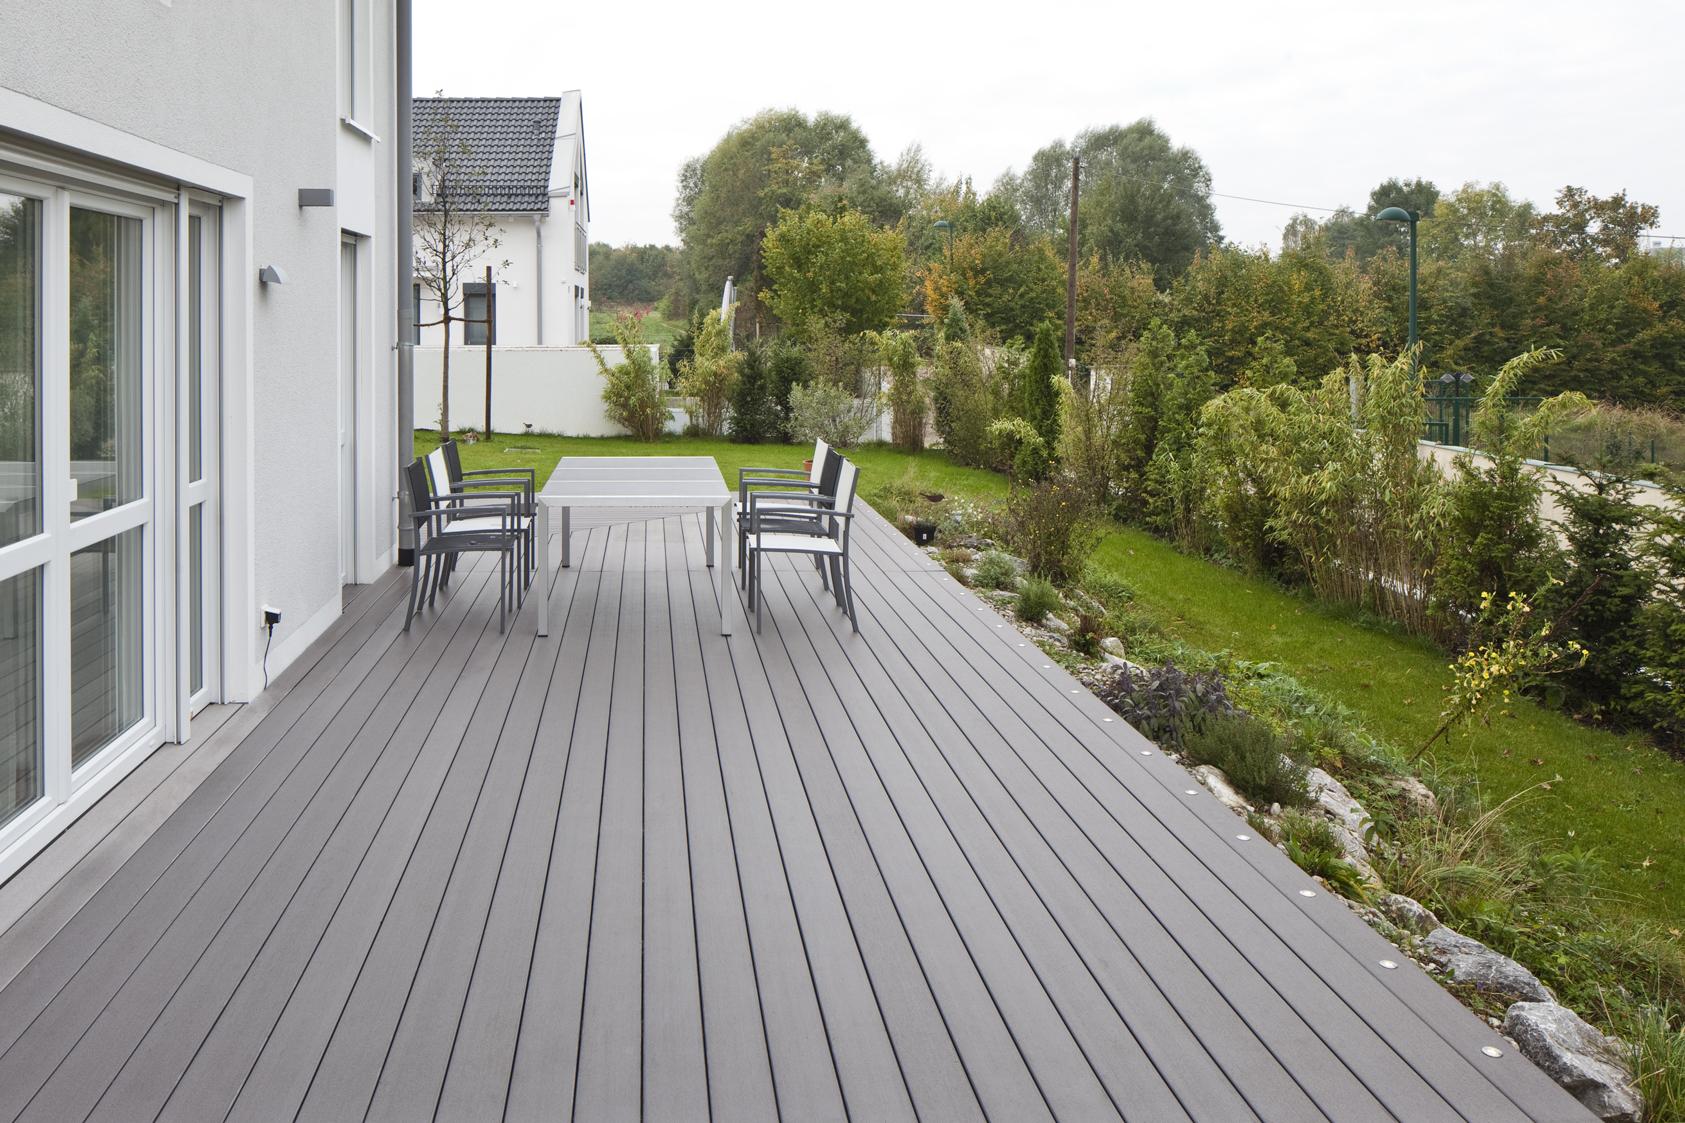 wpc terrassen in verschiedenen farben bs holzdesign. Black Bedroom Furniture Sets. Home Design Ideas